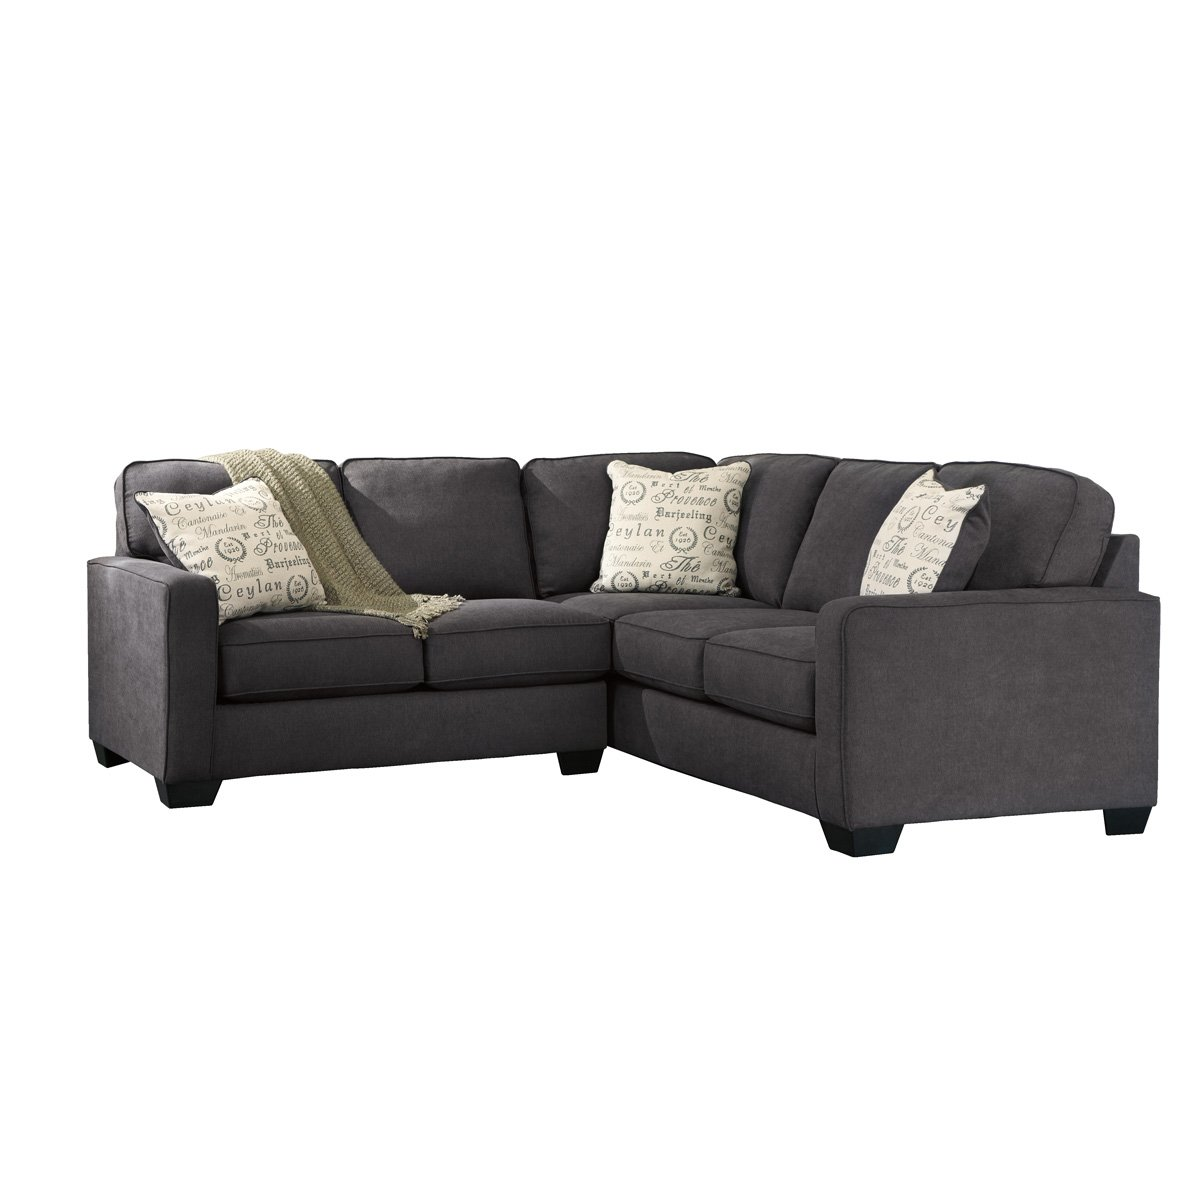 Sala modular ashley alenya gris sofa love seat sears com for Sofa modular gris